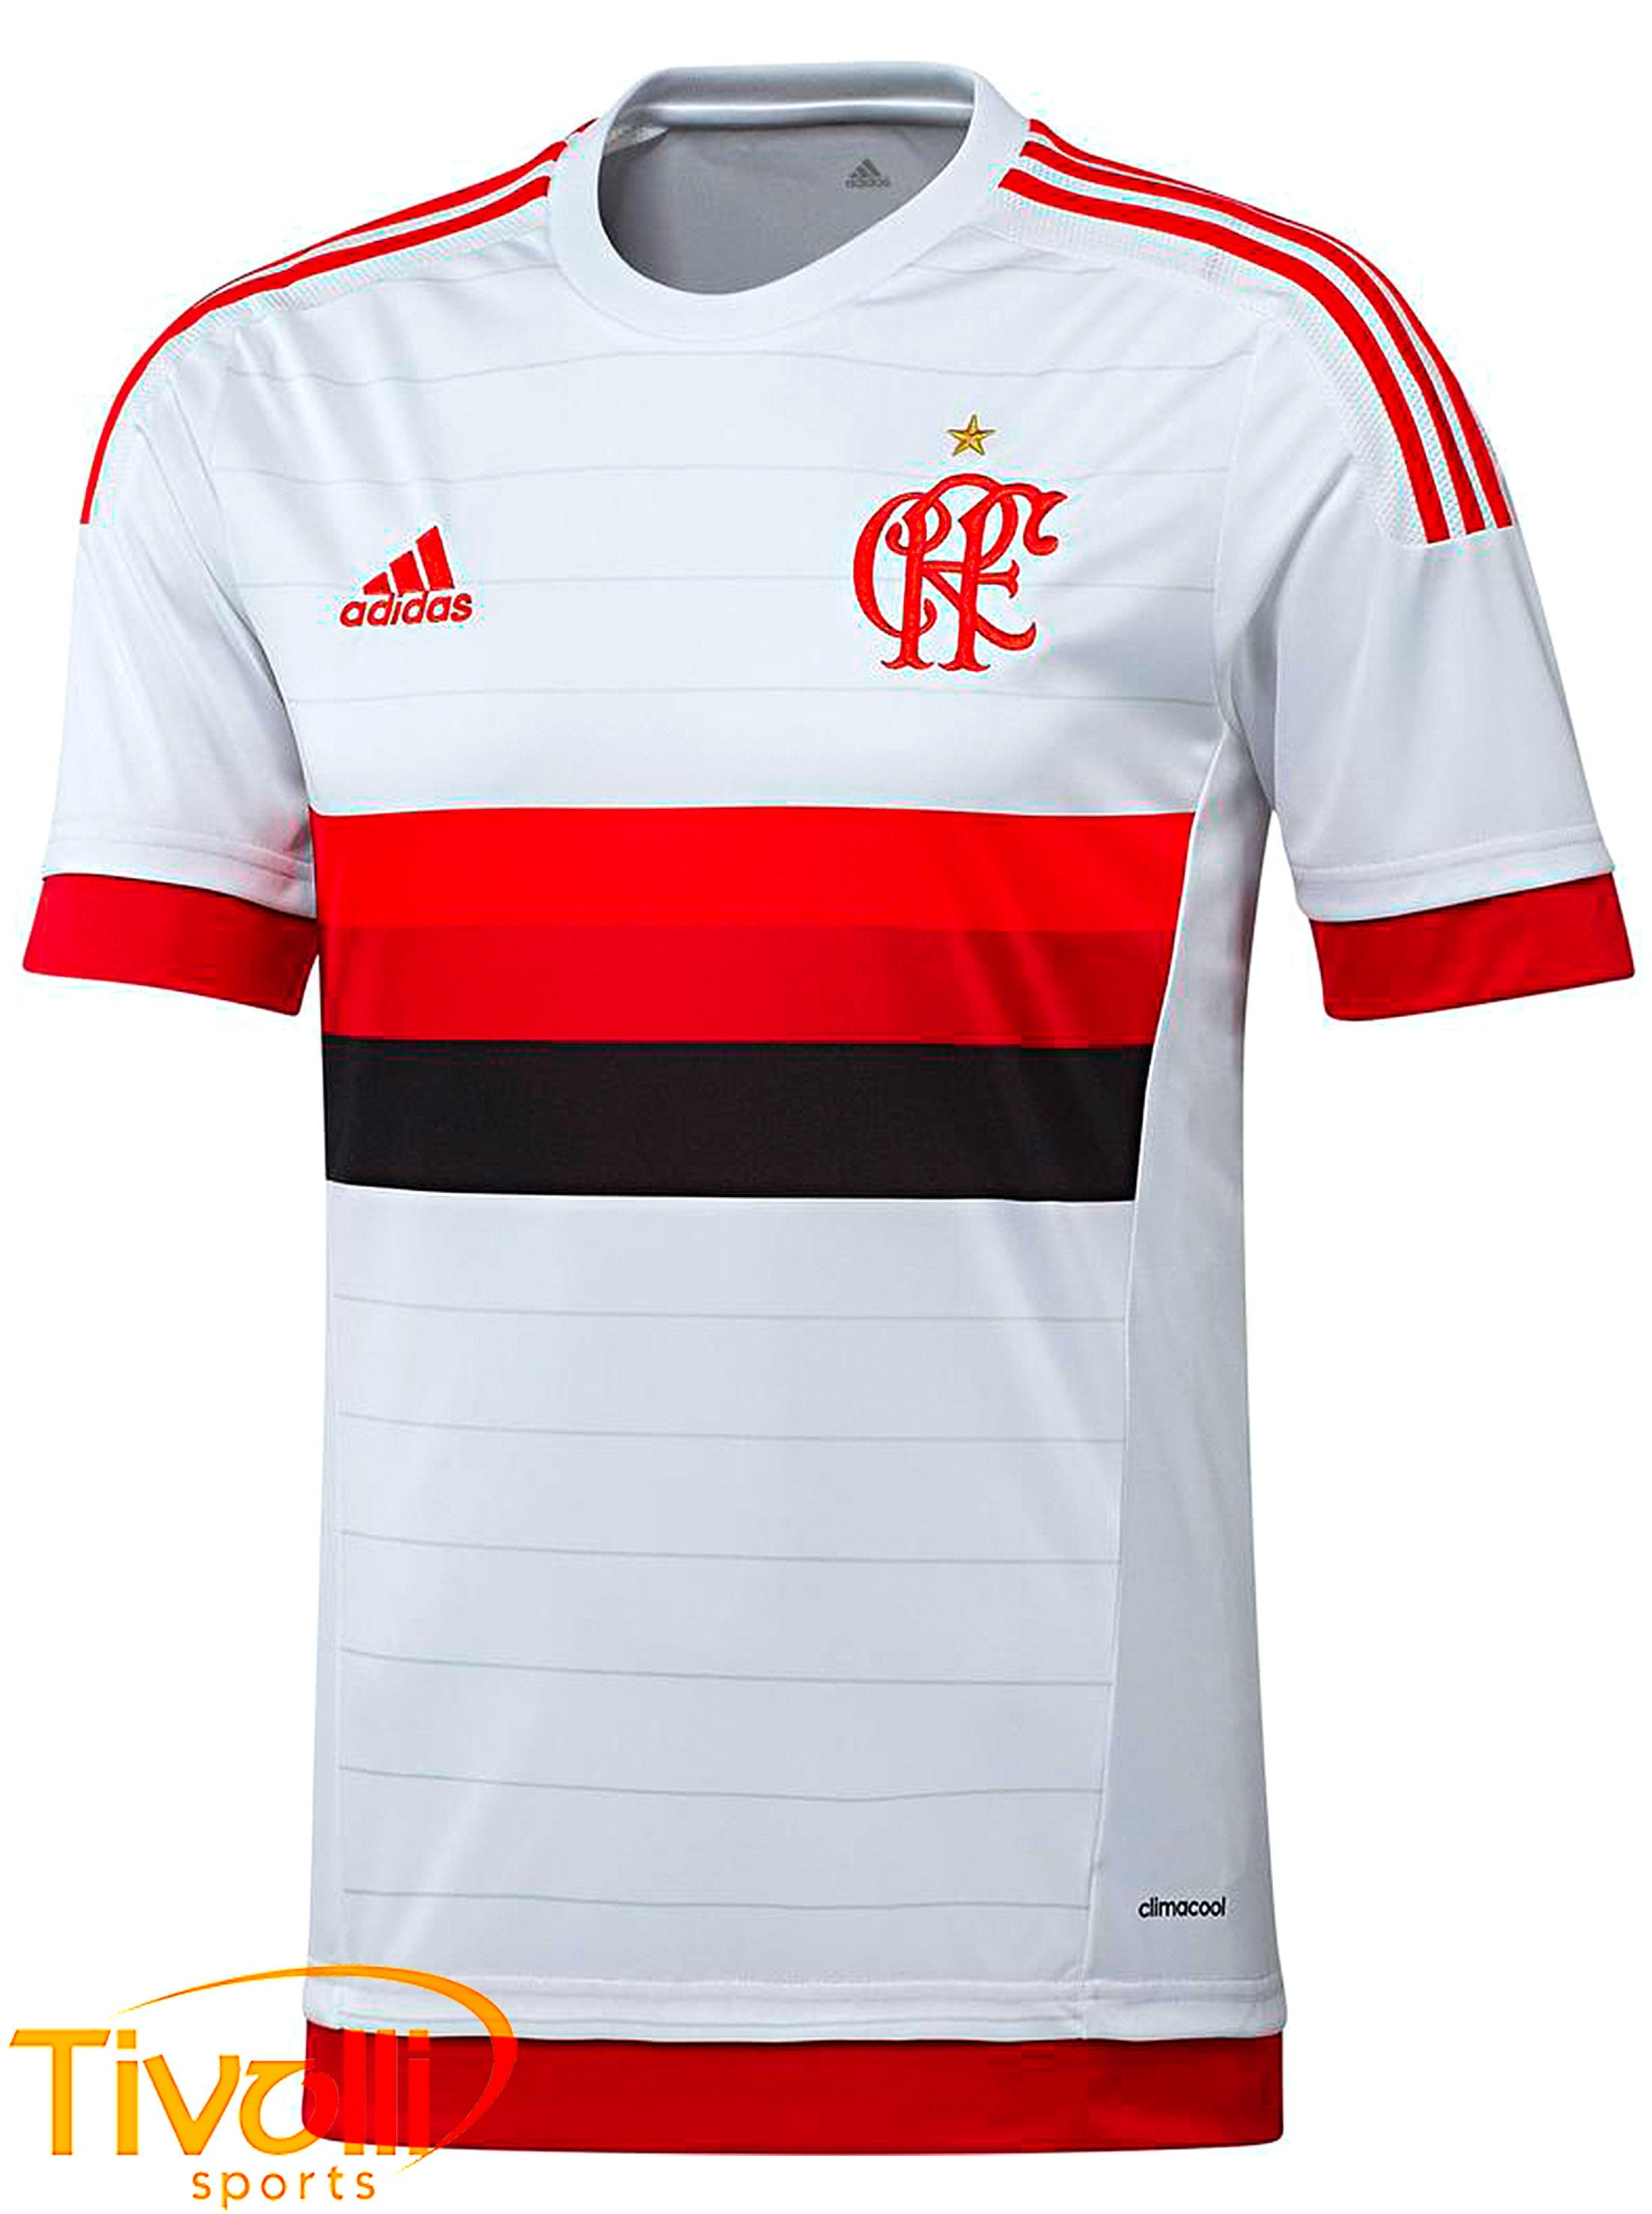 f4ede1a51c895 Camisa Flamengo II Adidas   Branca